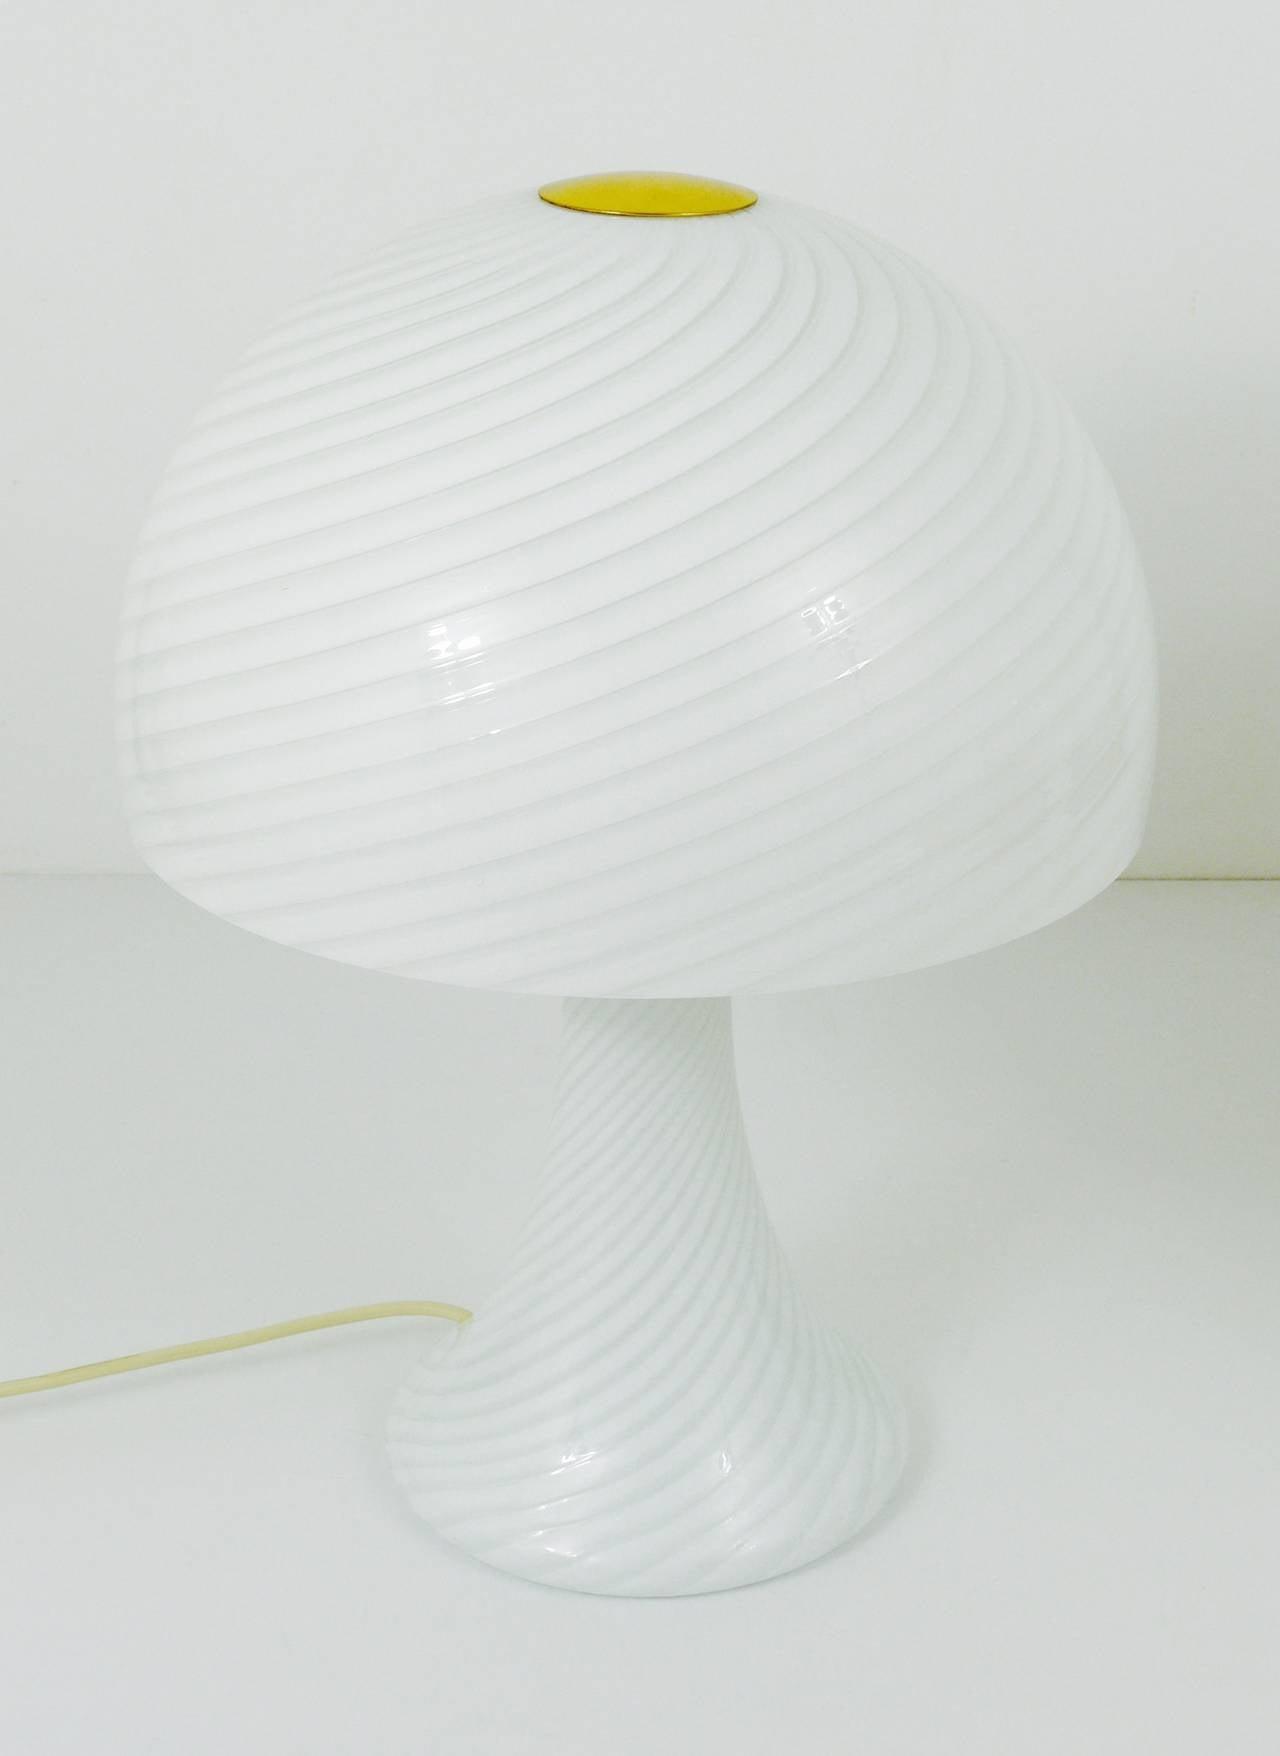 Austrian Pair of Kalmar Murano Glass and Brass Mushroom Lamps by Vistosi, 1960s For Sale